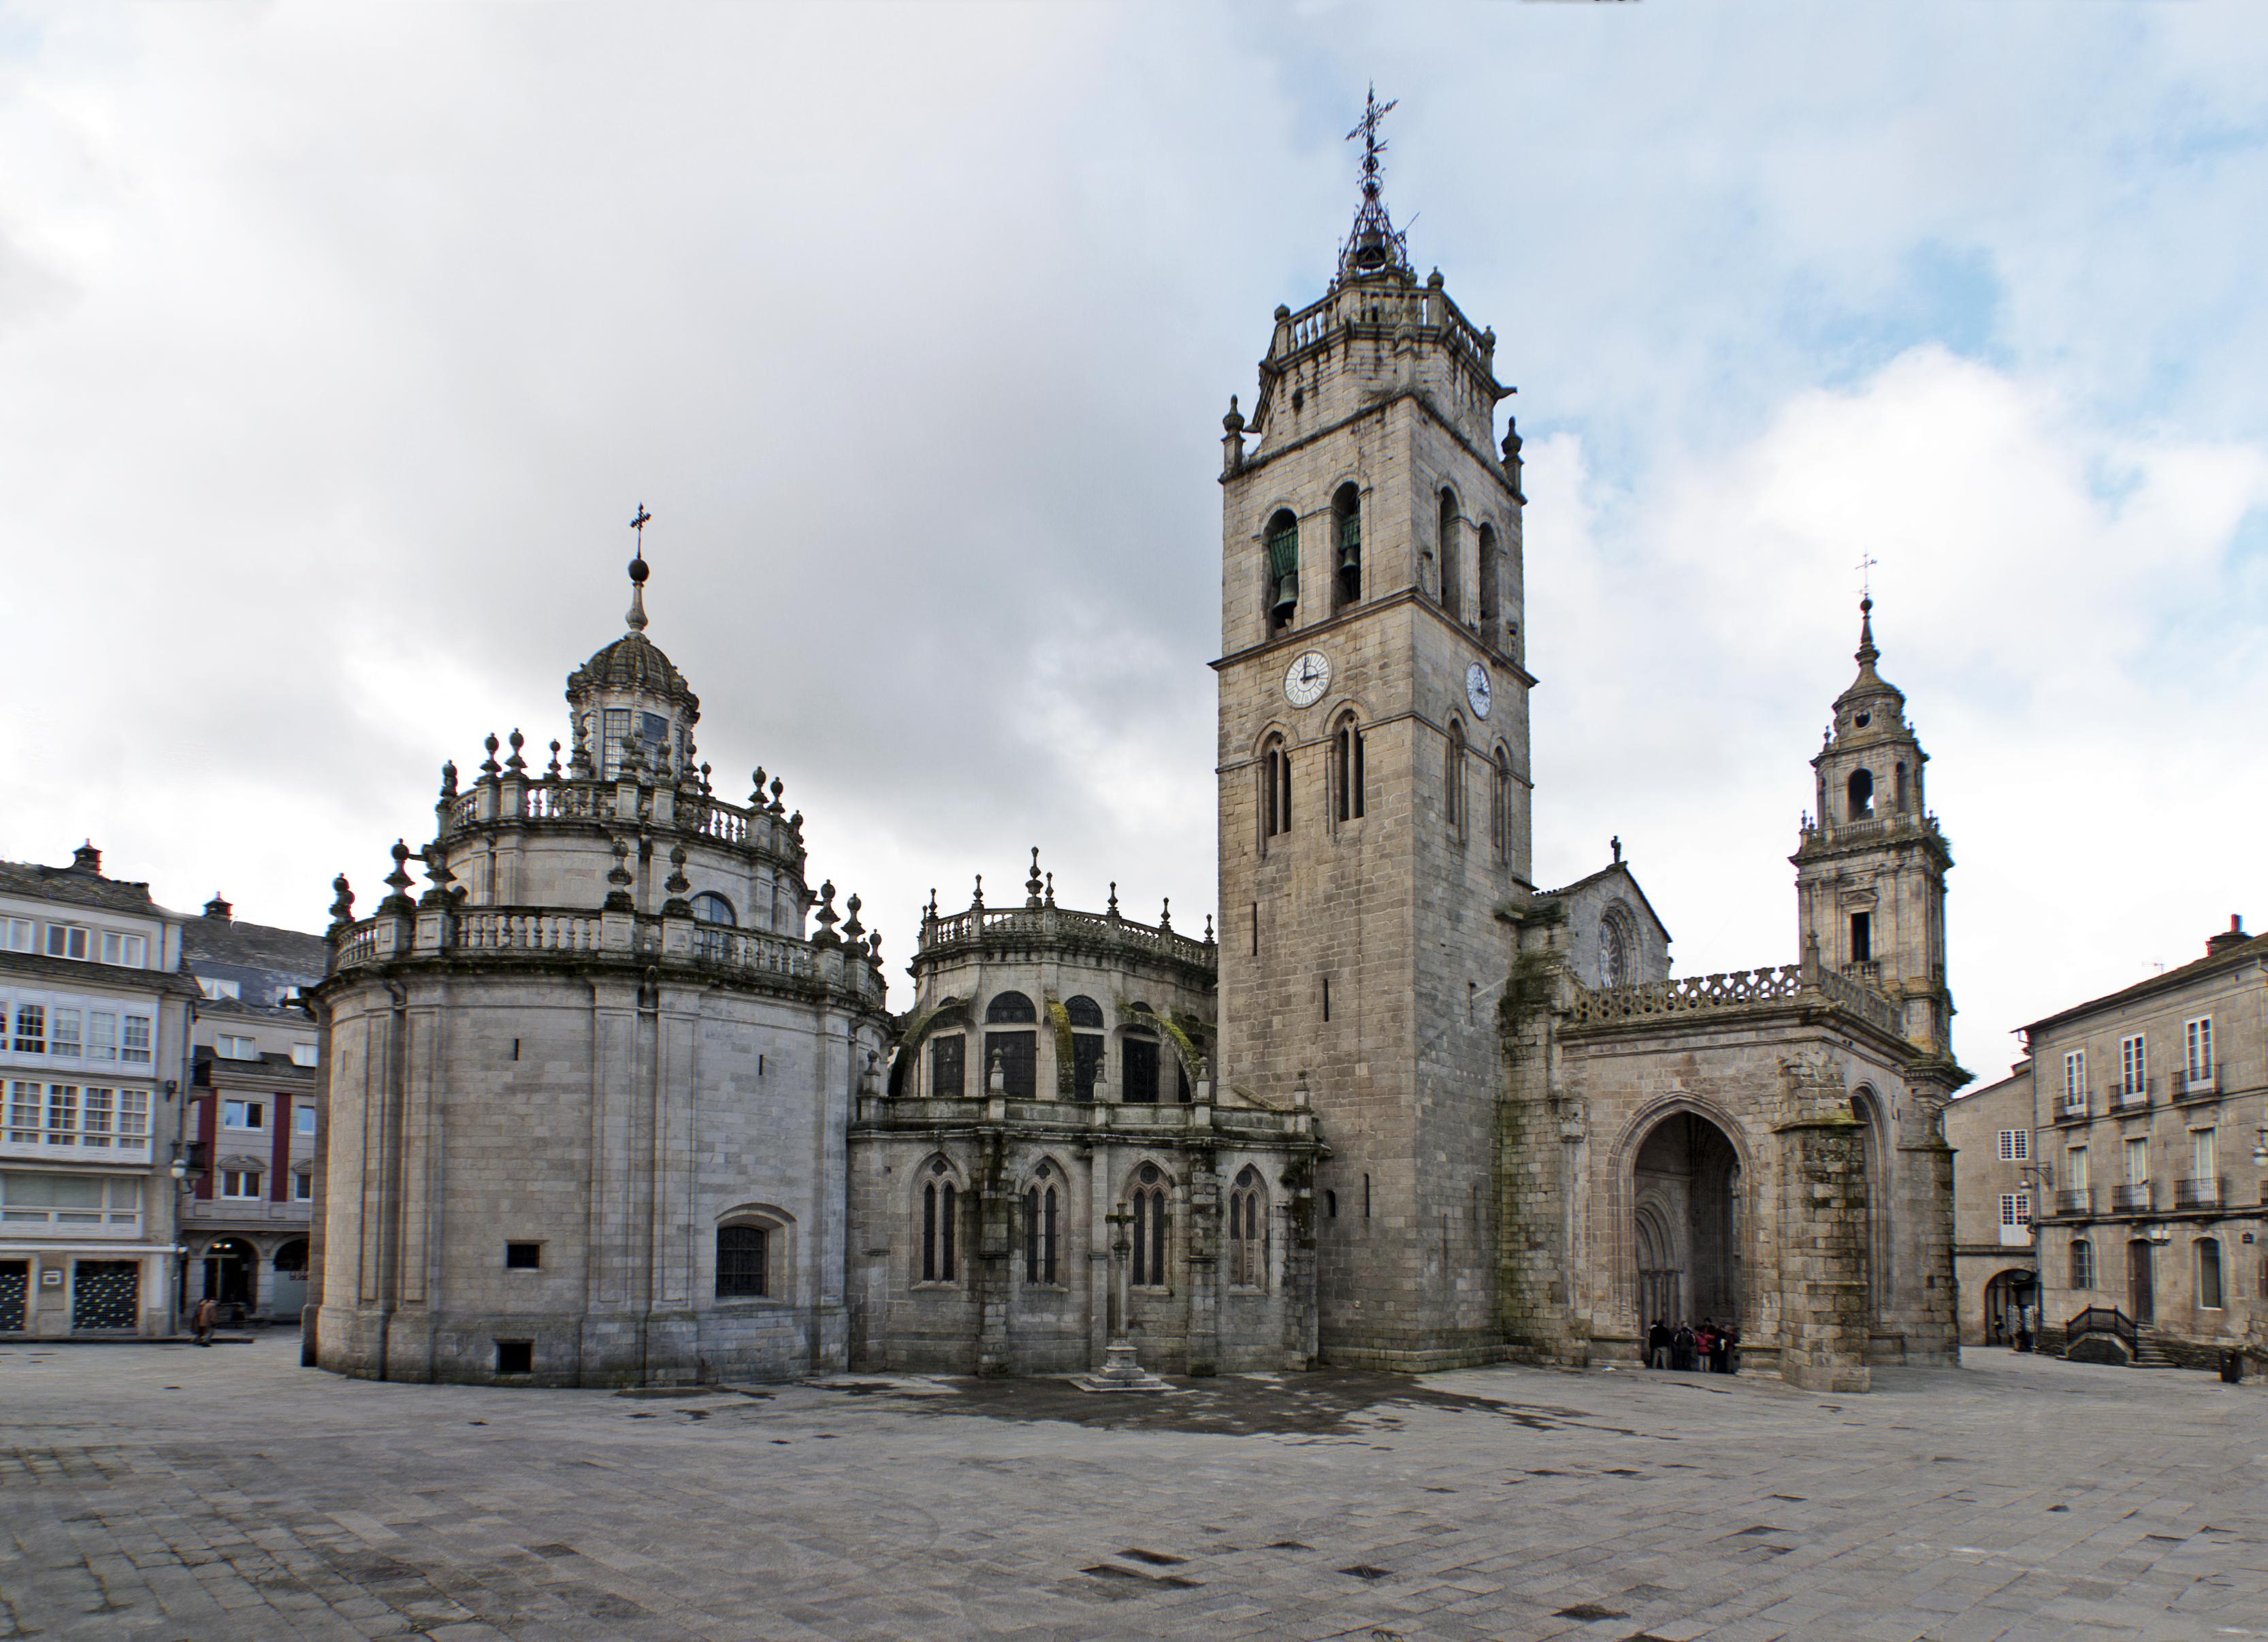 File:Catedral de Santa Maria, Lugo.jpg - Wikimedia Commons